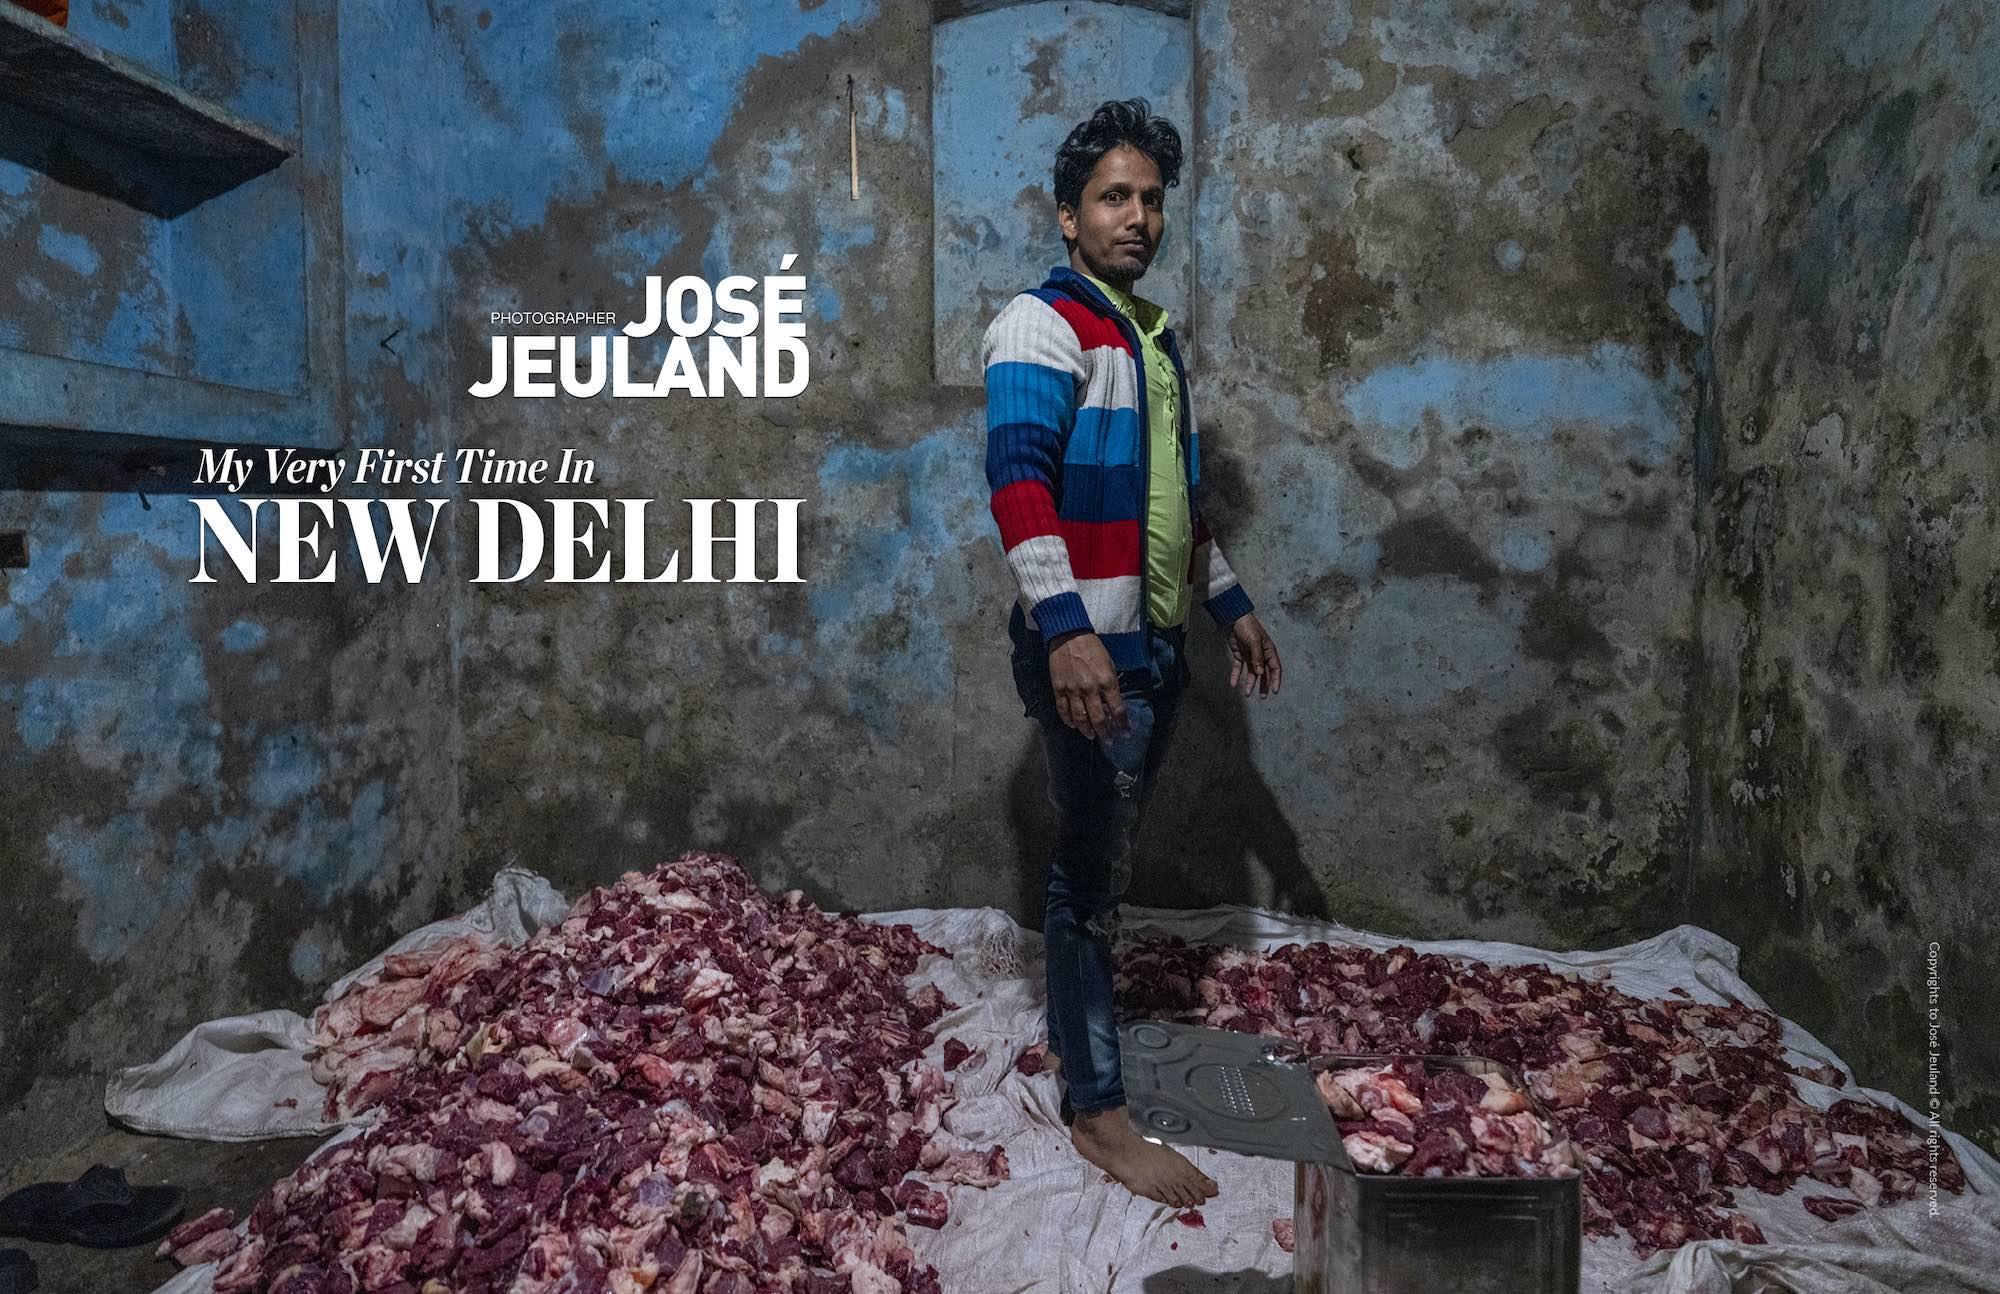 Lens Magazine Issue 6620 Jose Jeuland Photographer Contributor India New Delhi Street Photography